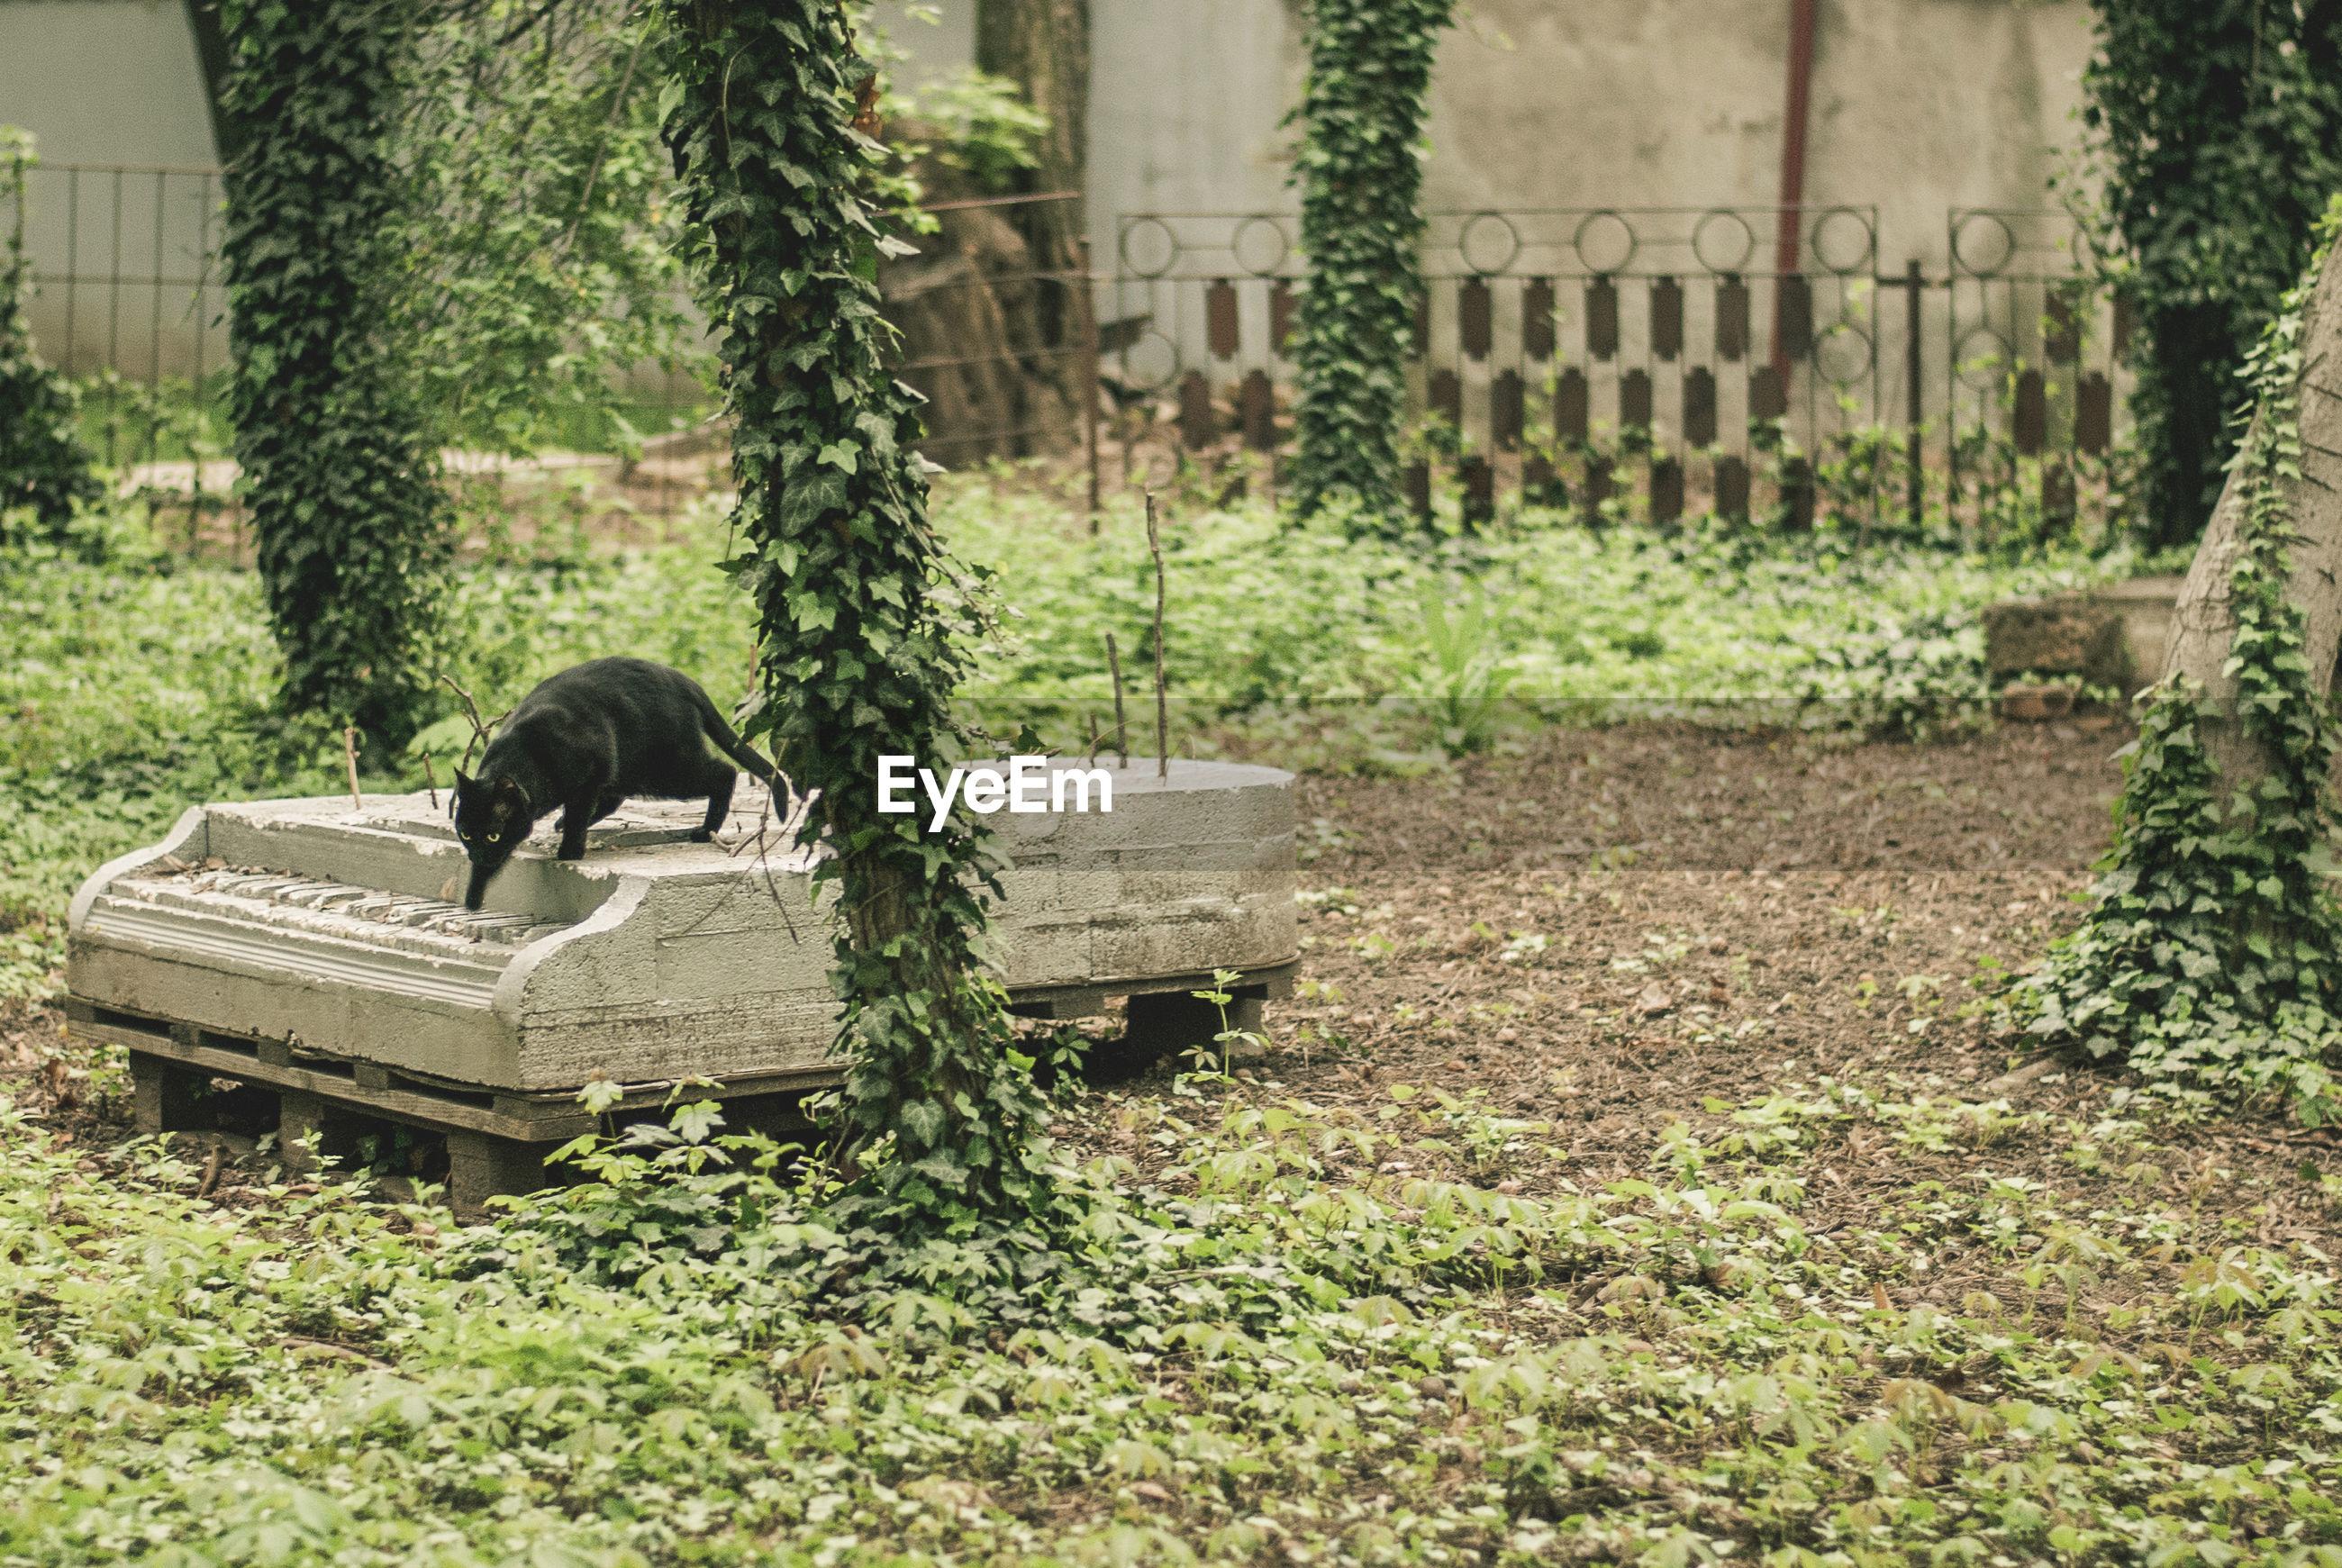 Cat walking on built structure amidst plants